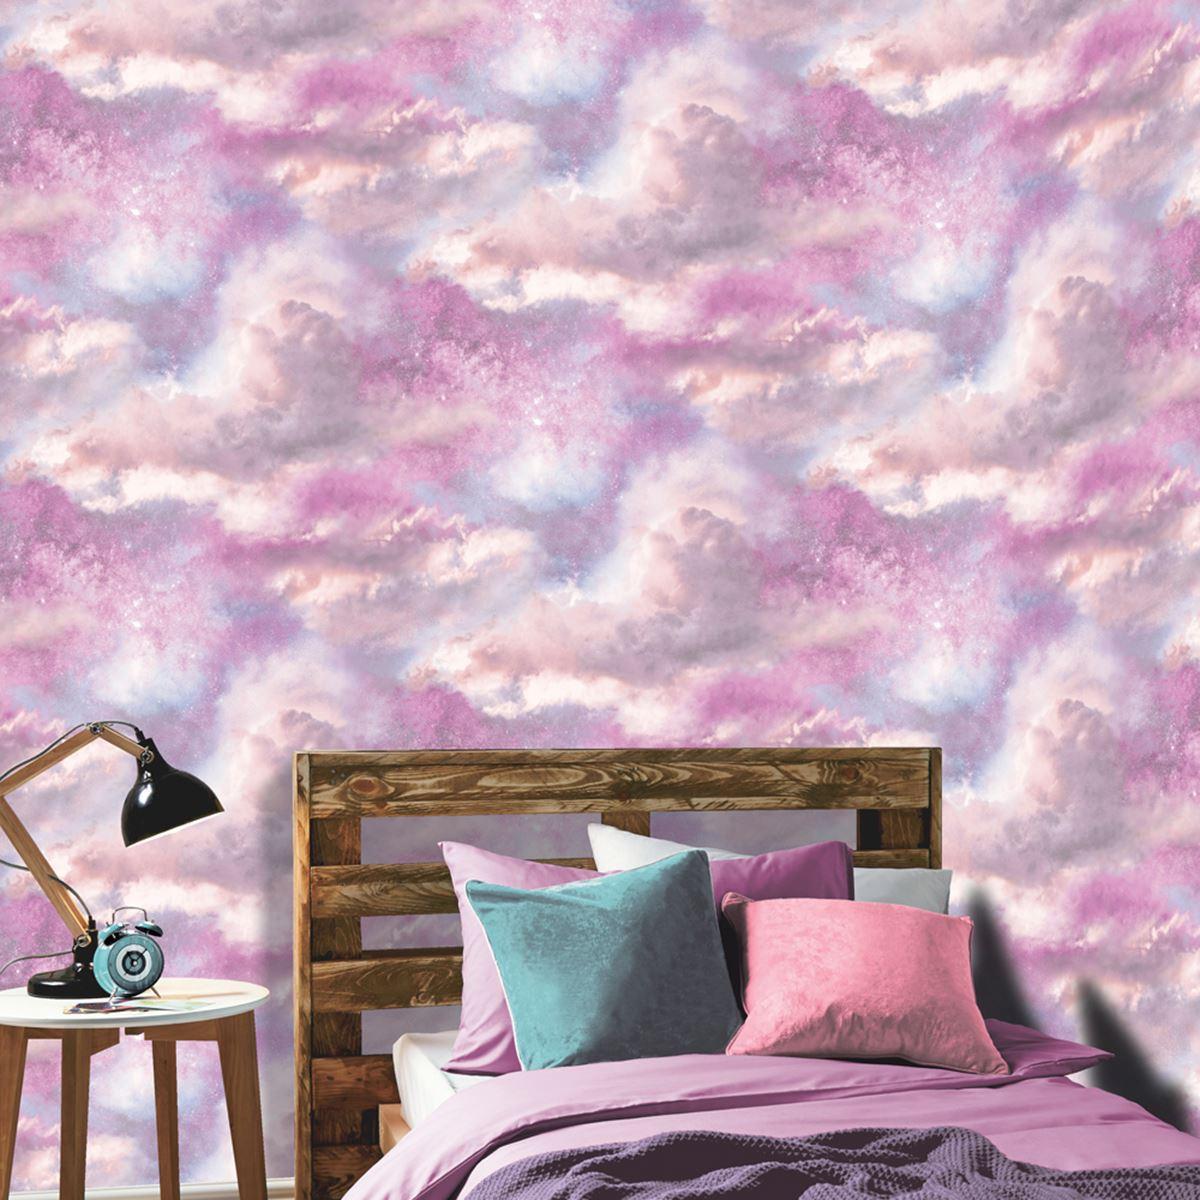 arthouse strass galaxy wolke tapete raum glitzer effekt. Black Bedroom Furniture Sets. Home Design Ideas